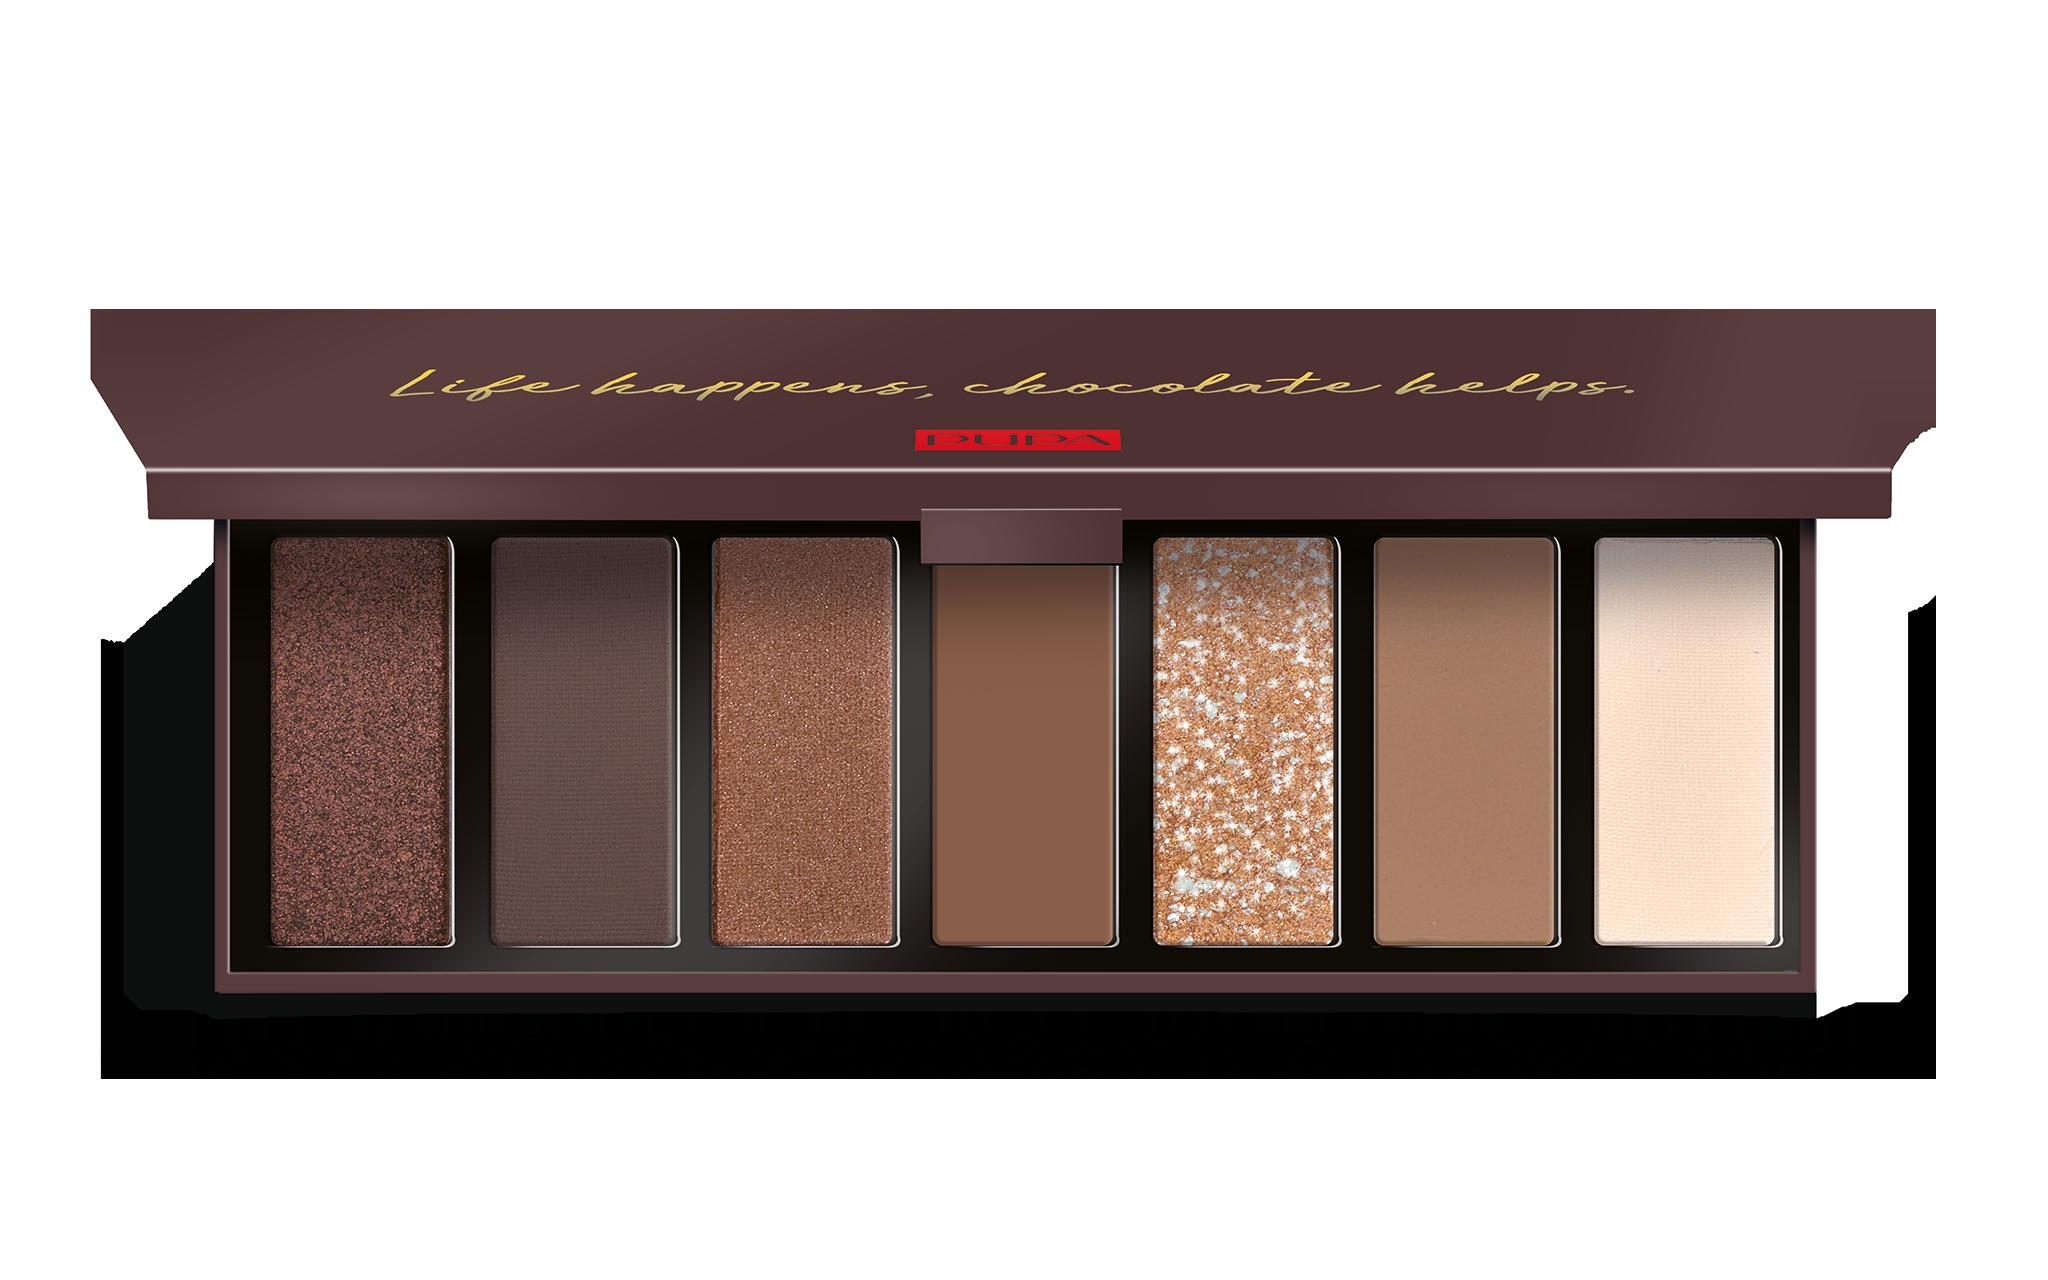 Zero Calorie Chocolate Eyeshadow Palette - PUPA Milano